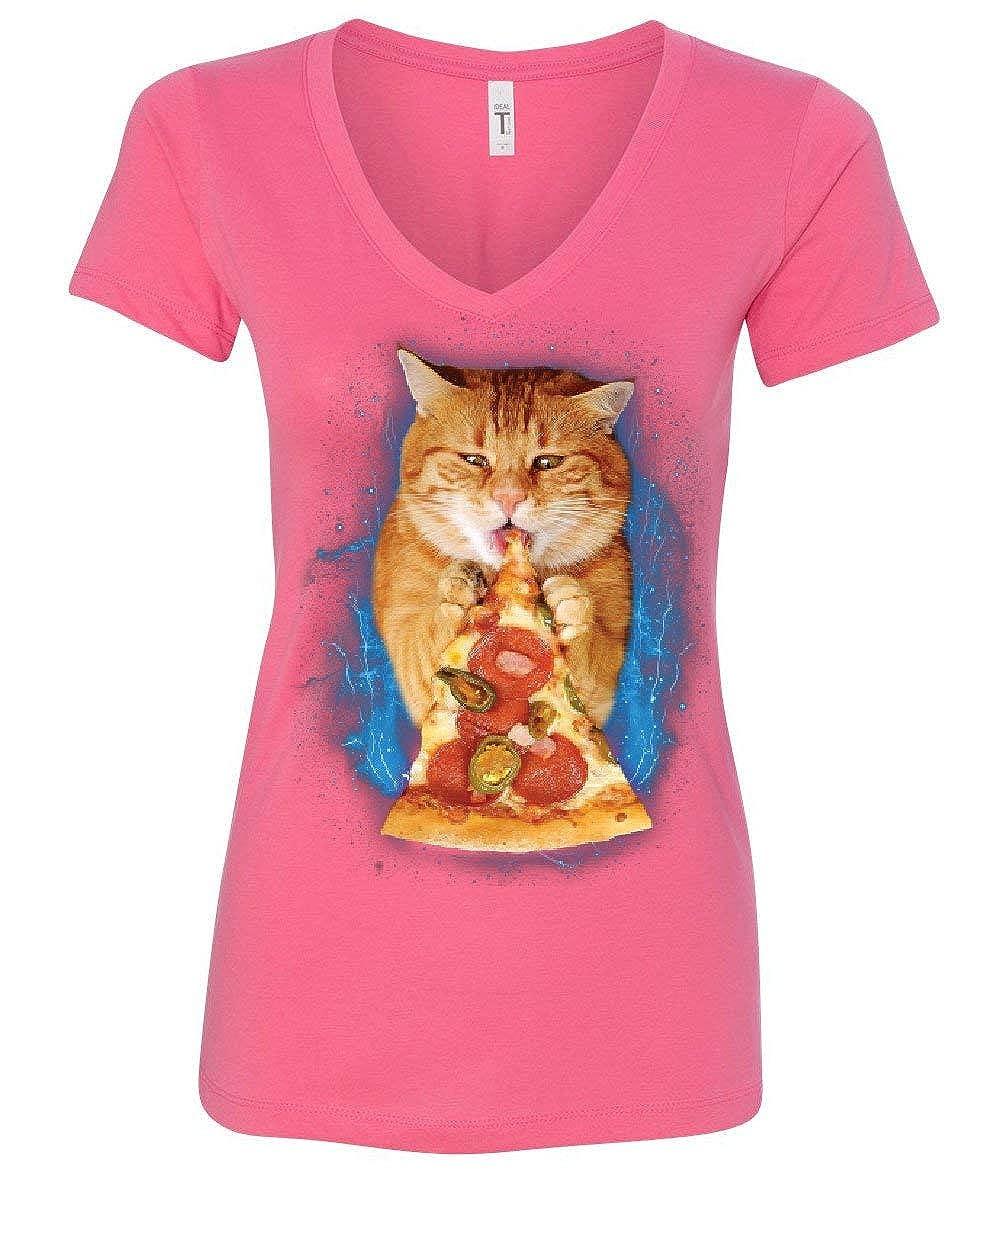 1408eb43f8 Amazon.com: Cat Eating Pizza Women's V-Neck T-Shirt Funny Weird Kitten Pet  Kitty Peperoni: Clothing